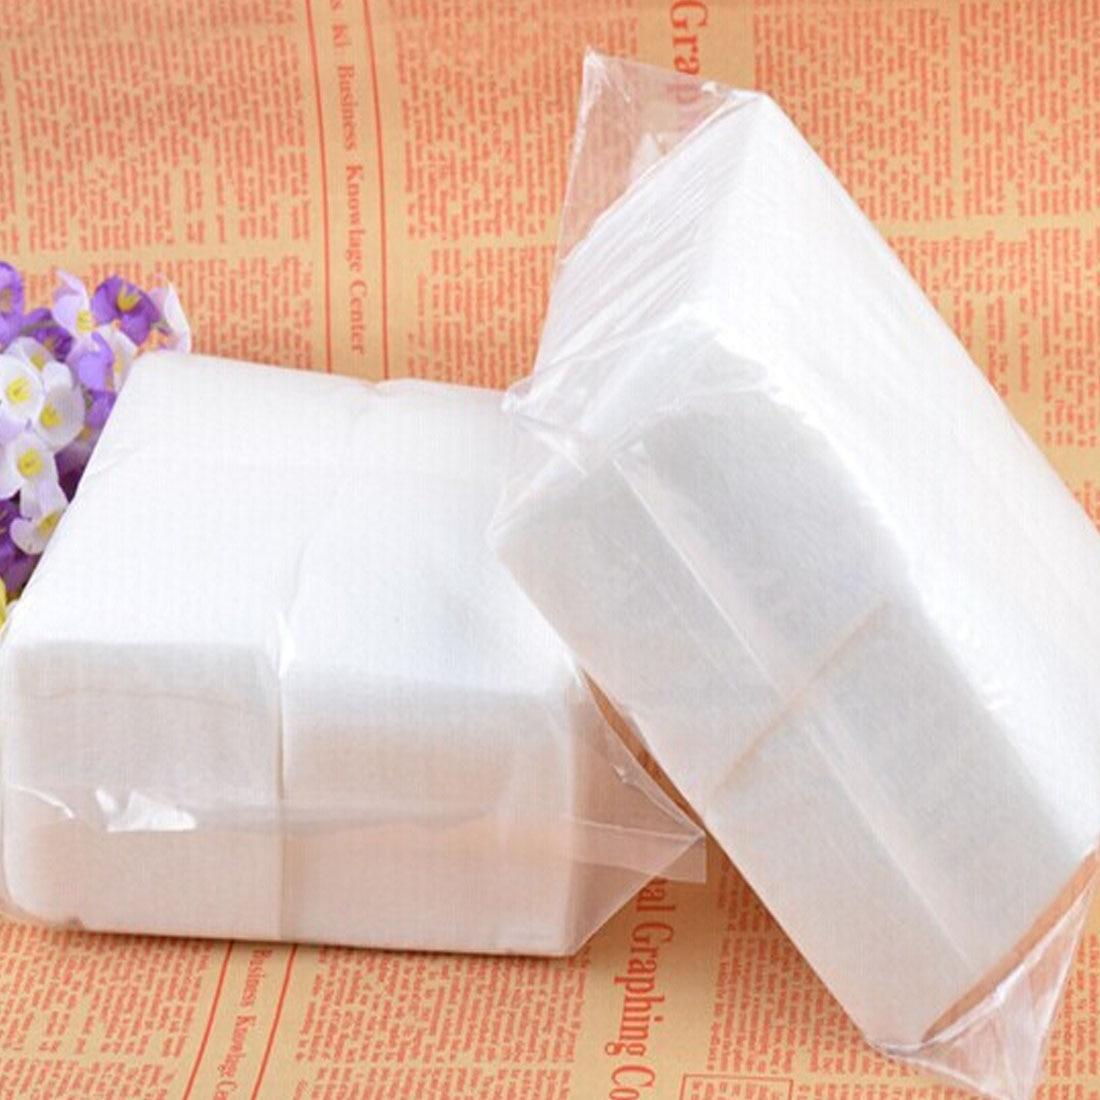 400pcs/set New Portable Nail Art Wipes Manicure Polish Wipes Cotton Lint Cotton Pads Paper Acrylic Gel Tips